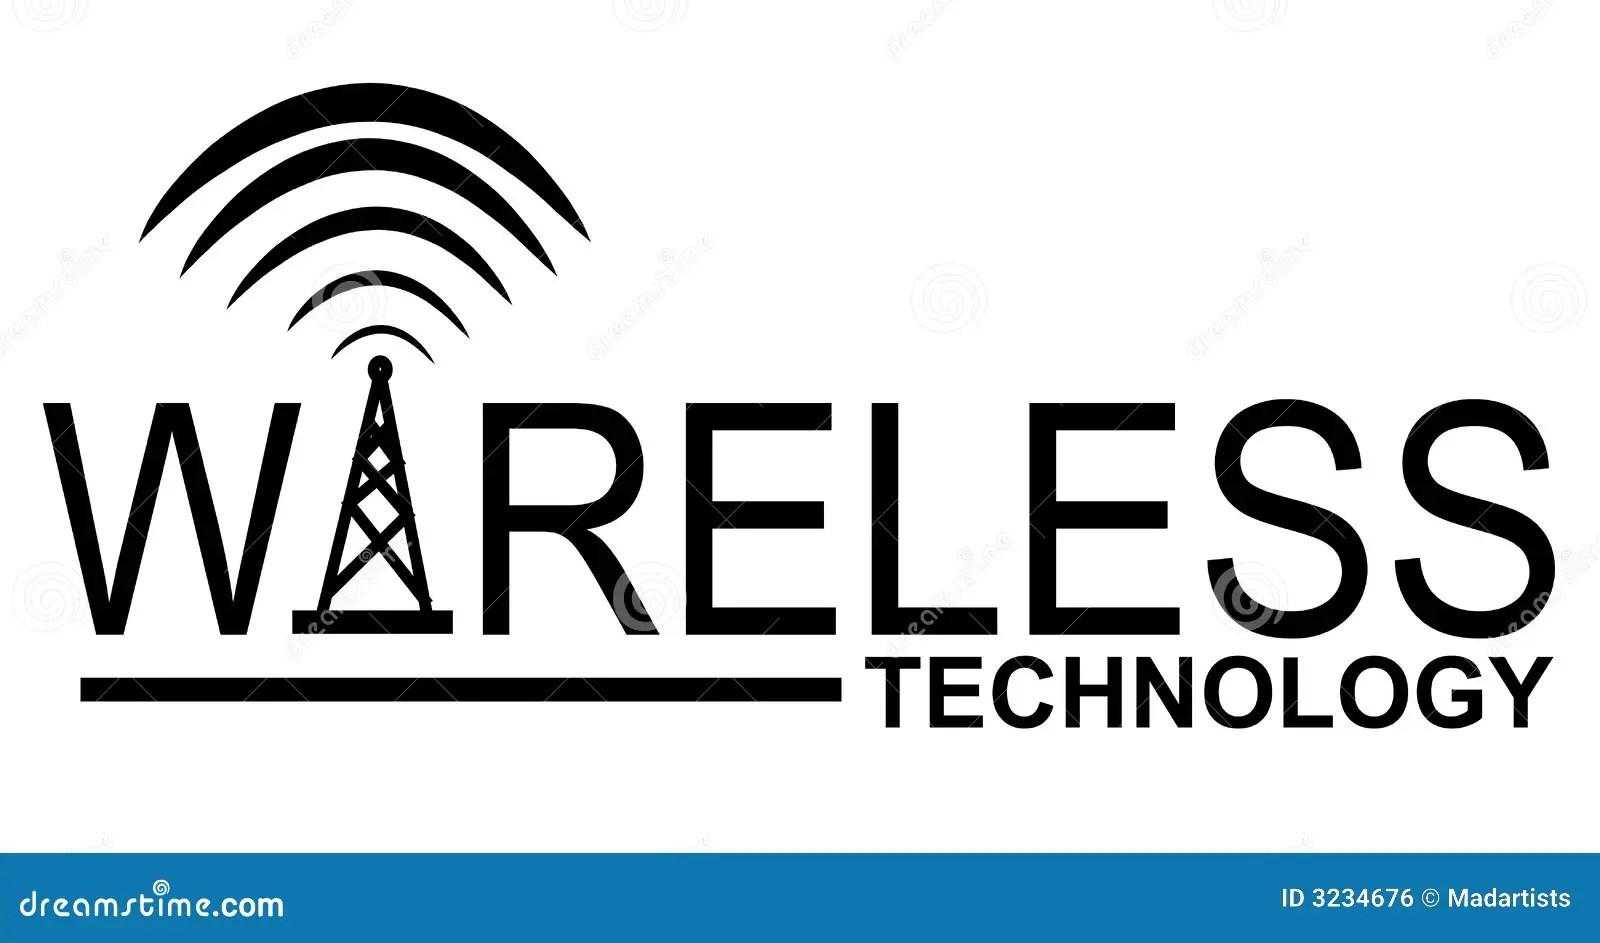 Wireless Technology Logo Royalty Free Stock Image